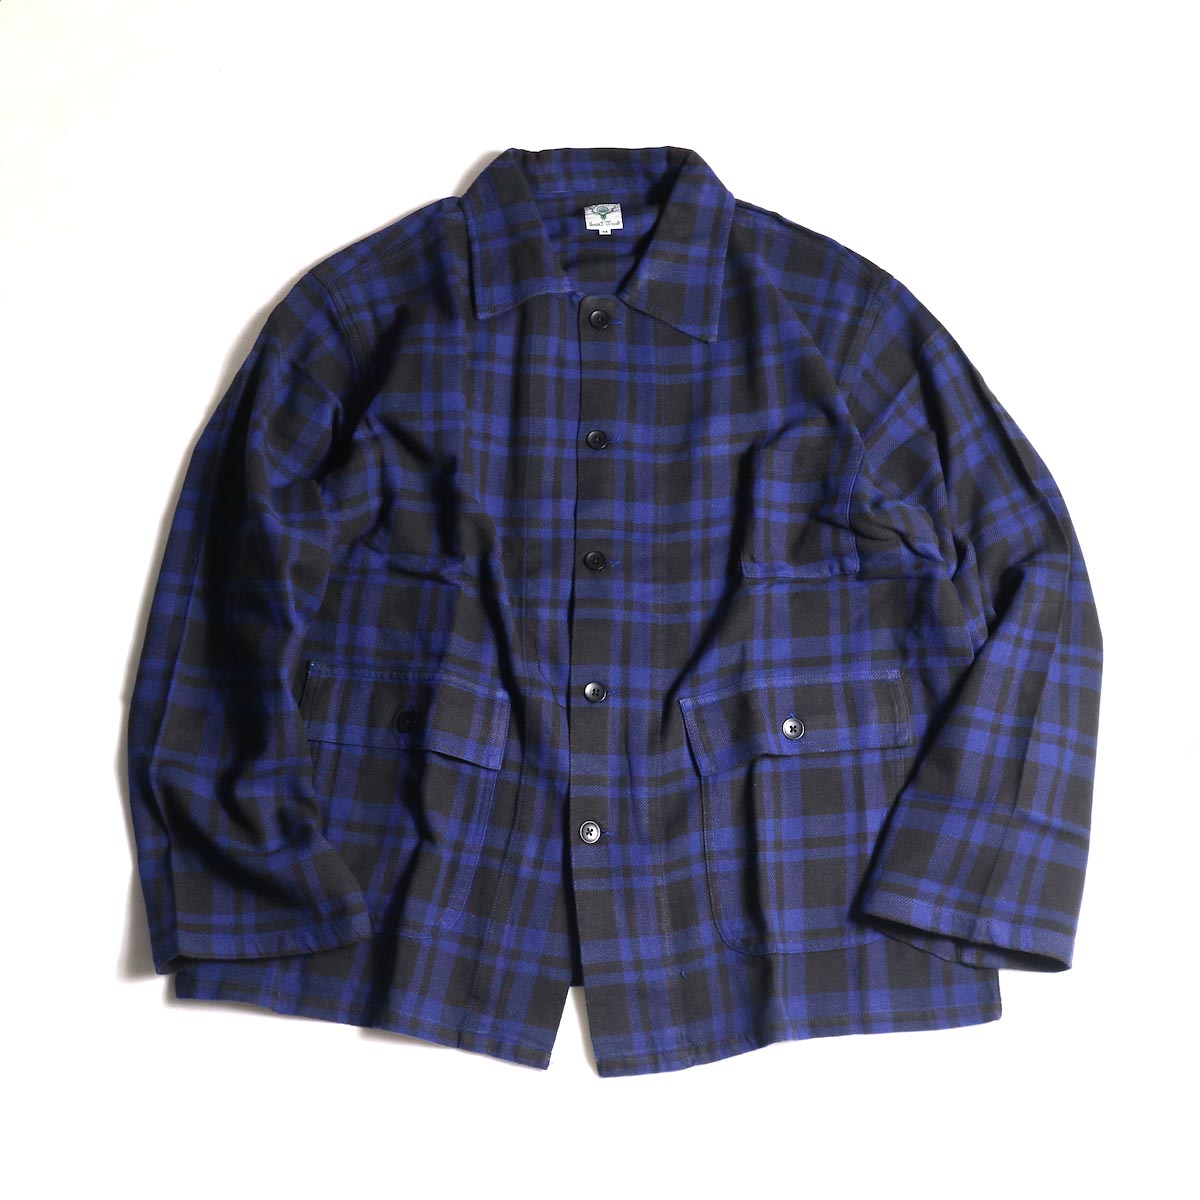 South2 West8 / Hunting Shirt -Plaid Twill (Blue/Black)